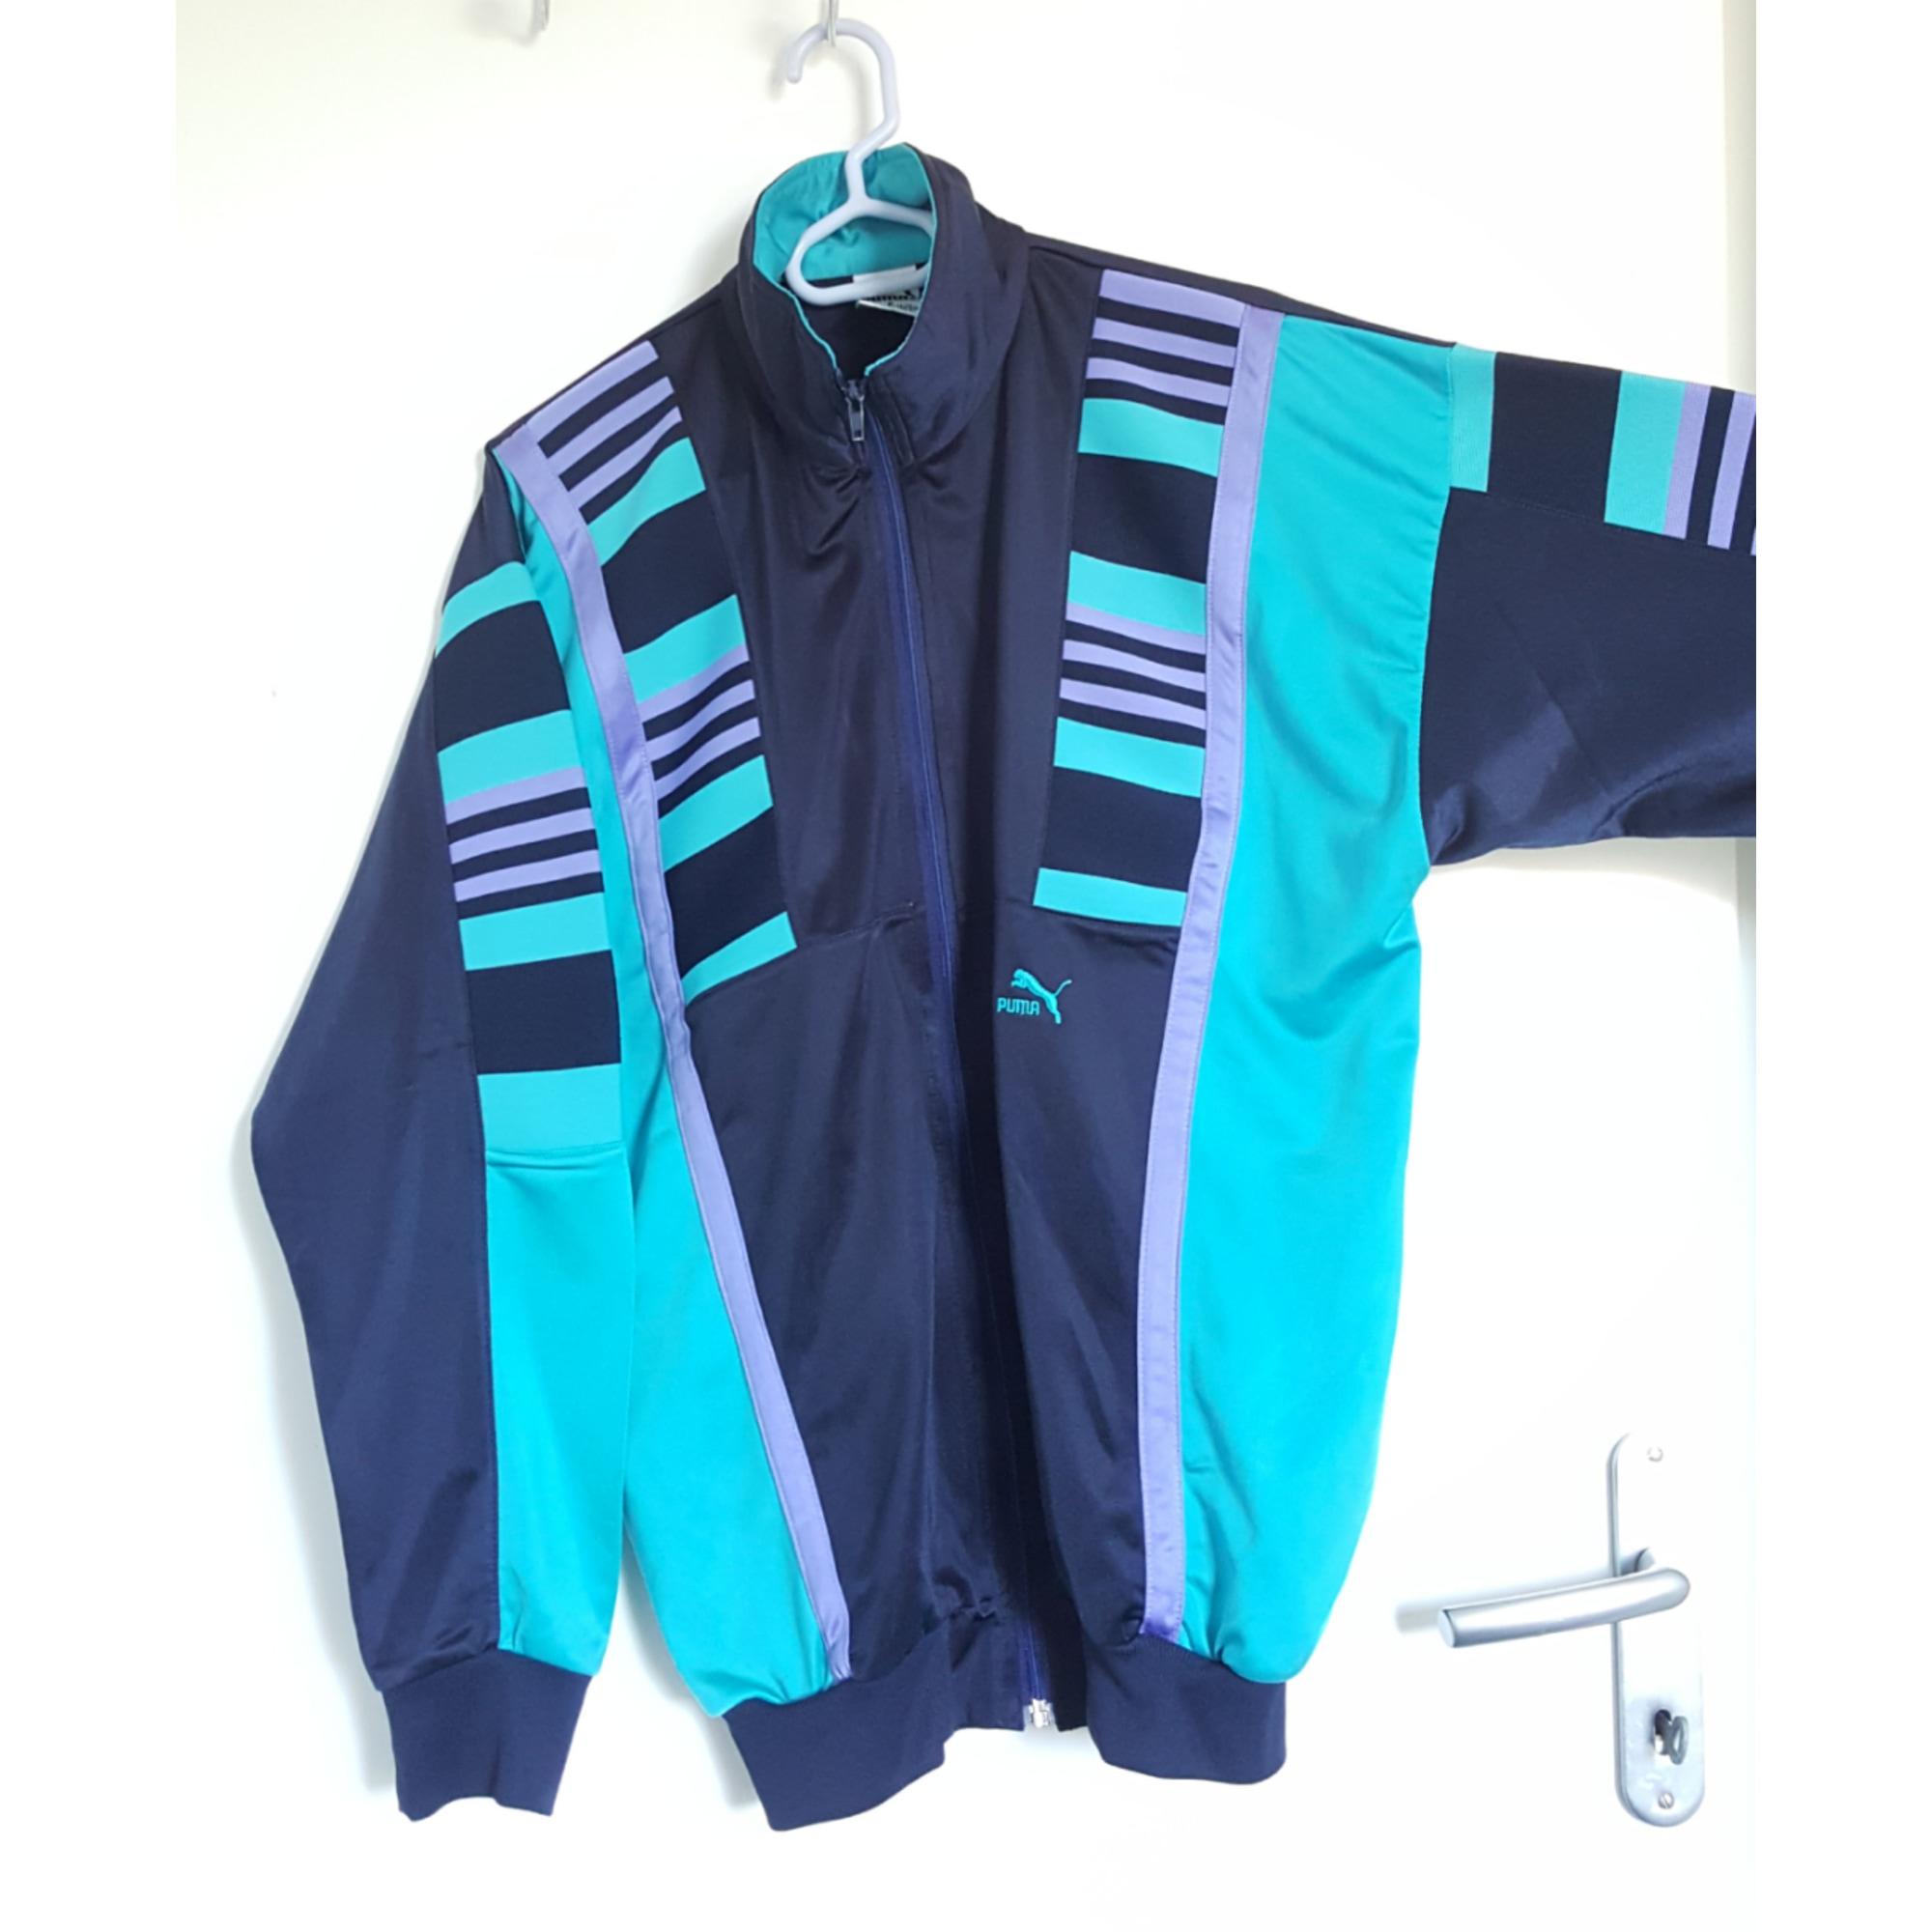 Haut de survêtement PUMA Bleu, bleu marine, bleu turquoise